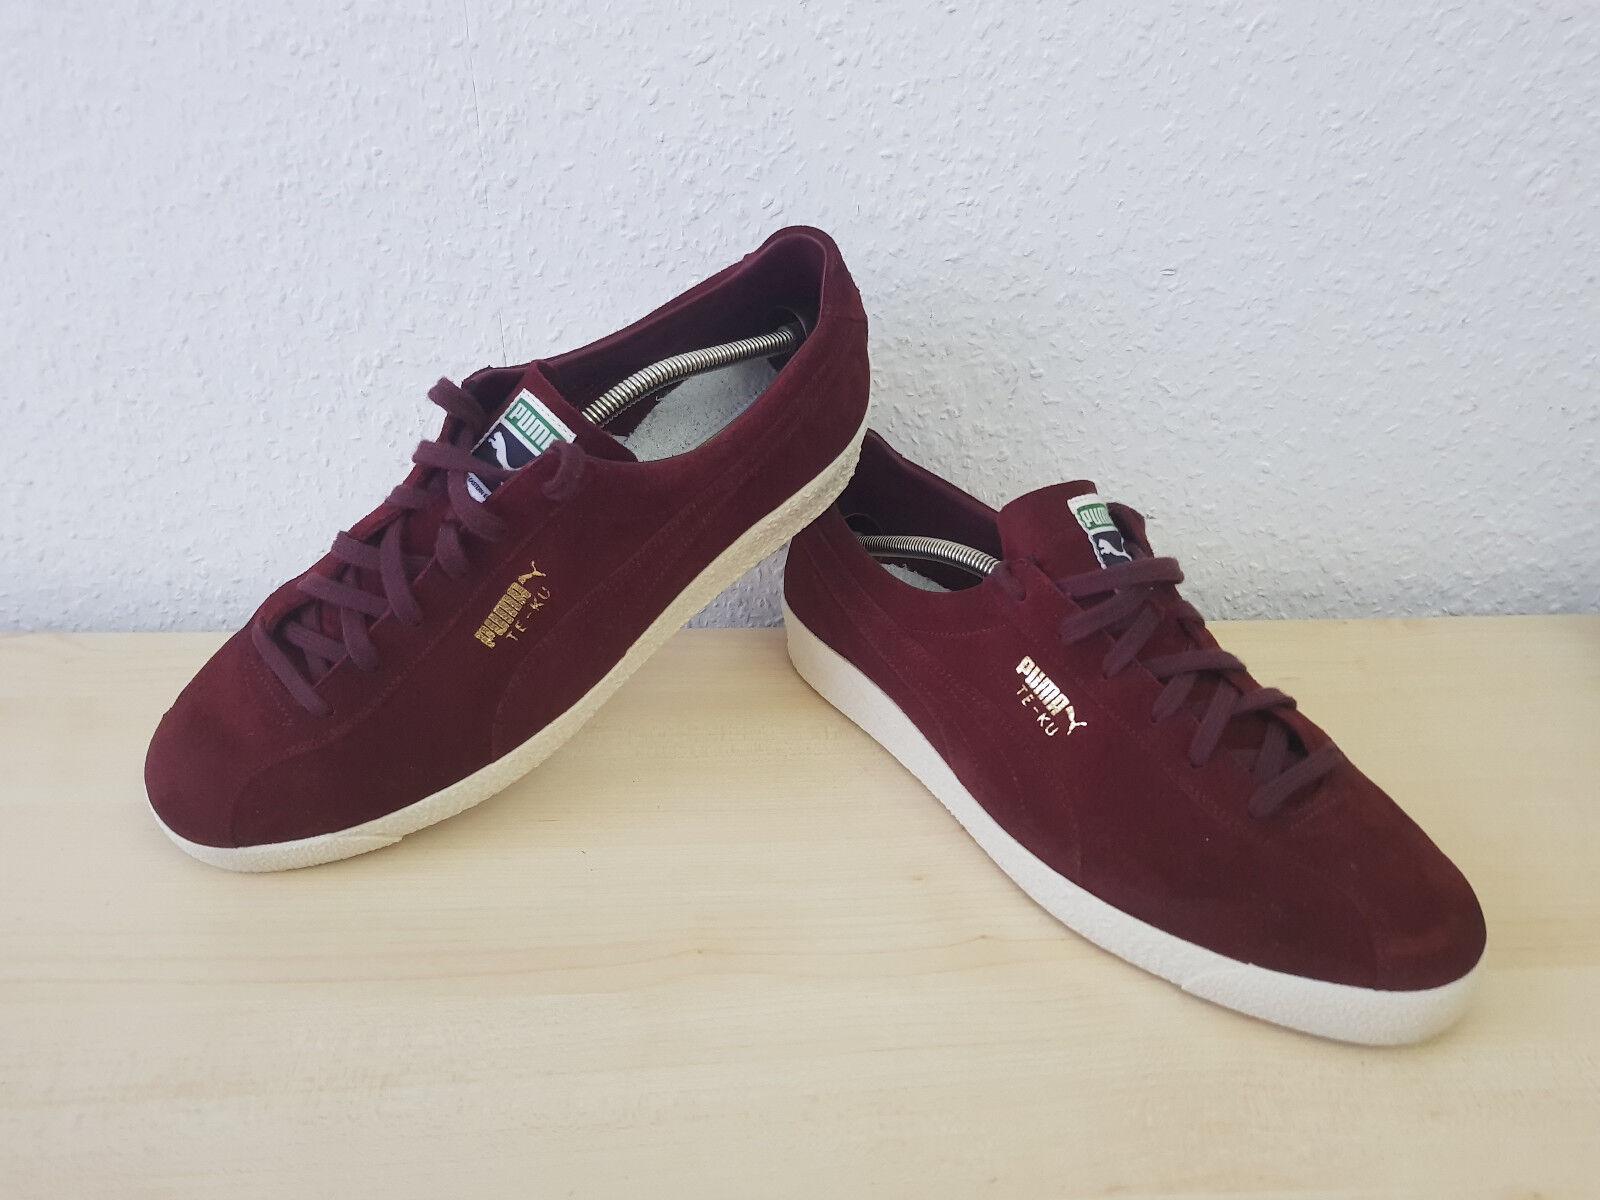 PUMB TE-KU Leder Wildleder Schuhe Sneaker Trainer Bordeaux 12 = 47 Wie NEU